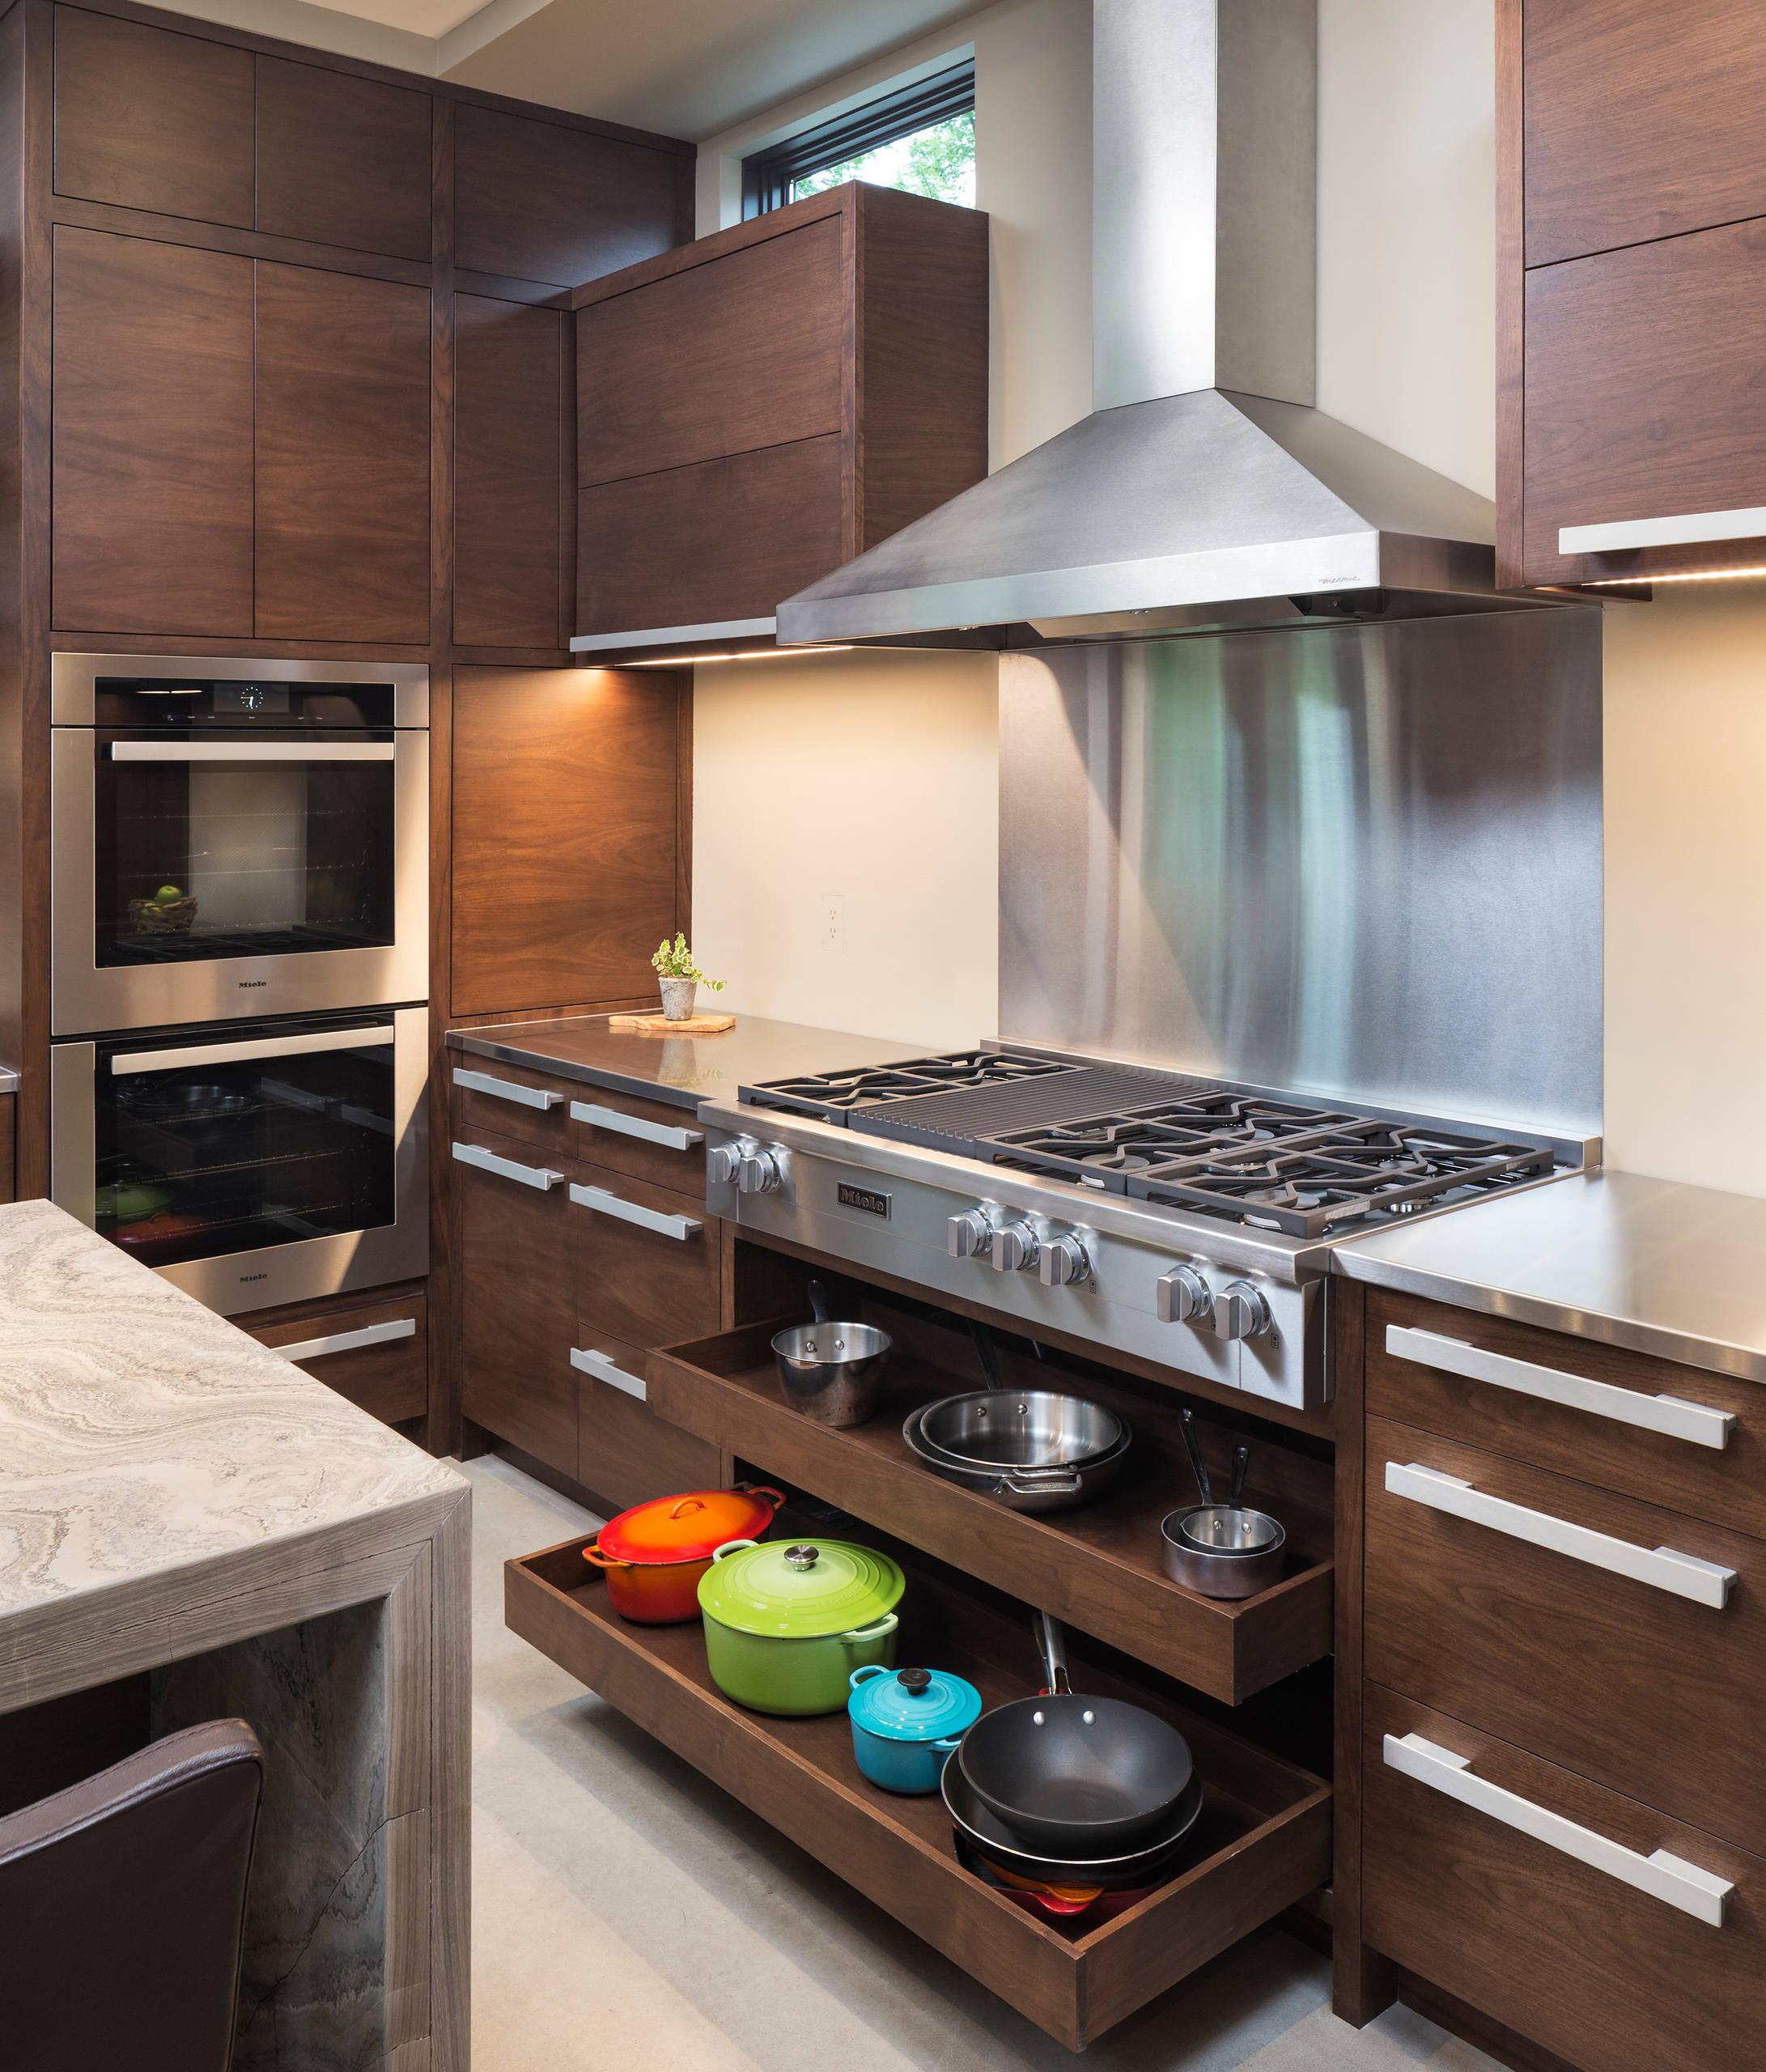 999 Beautiful Modern Kitchen Pictures Ideas October 2020 Houzz